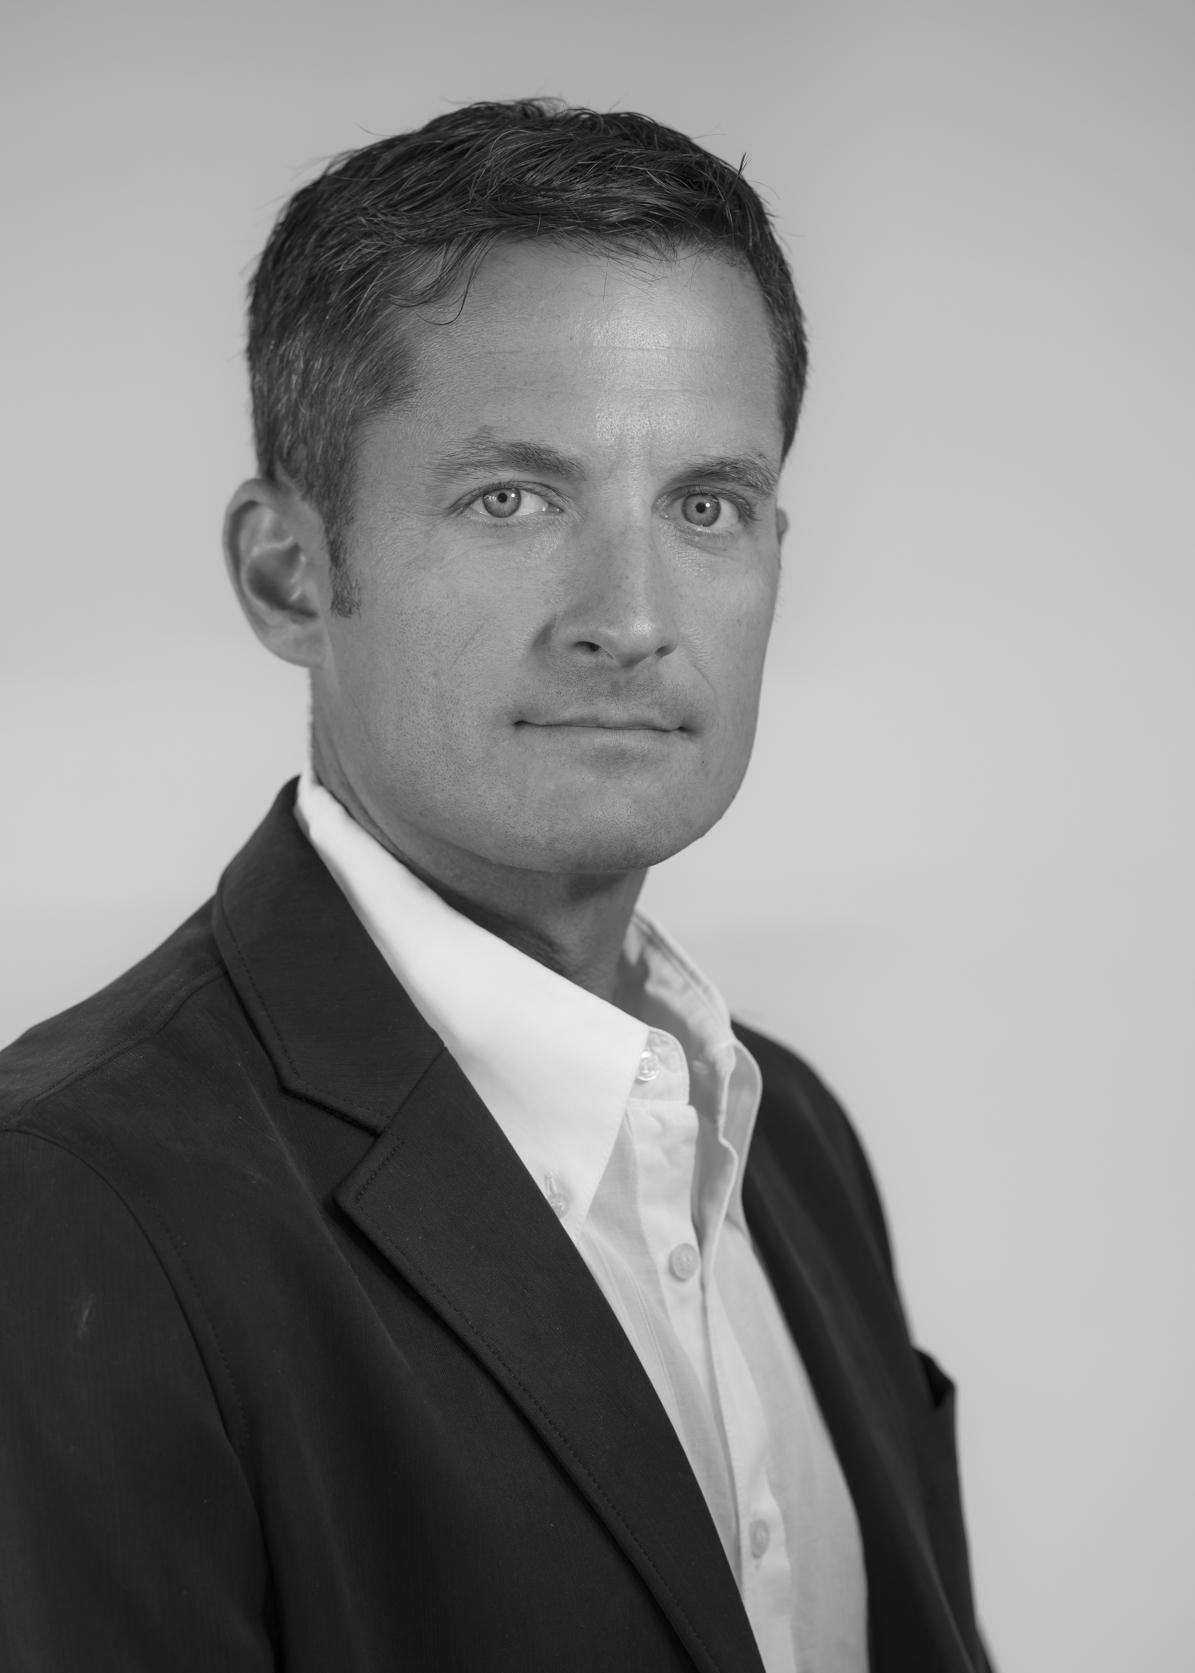 Nathan Visser